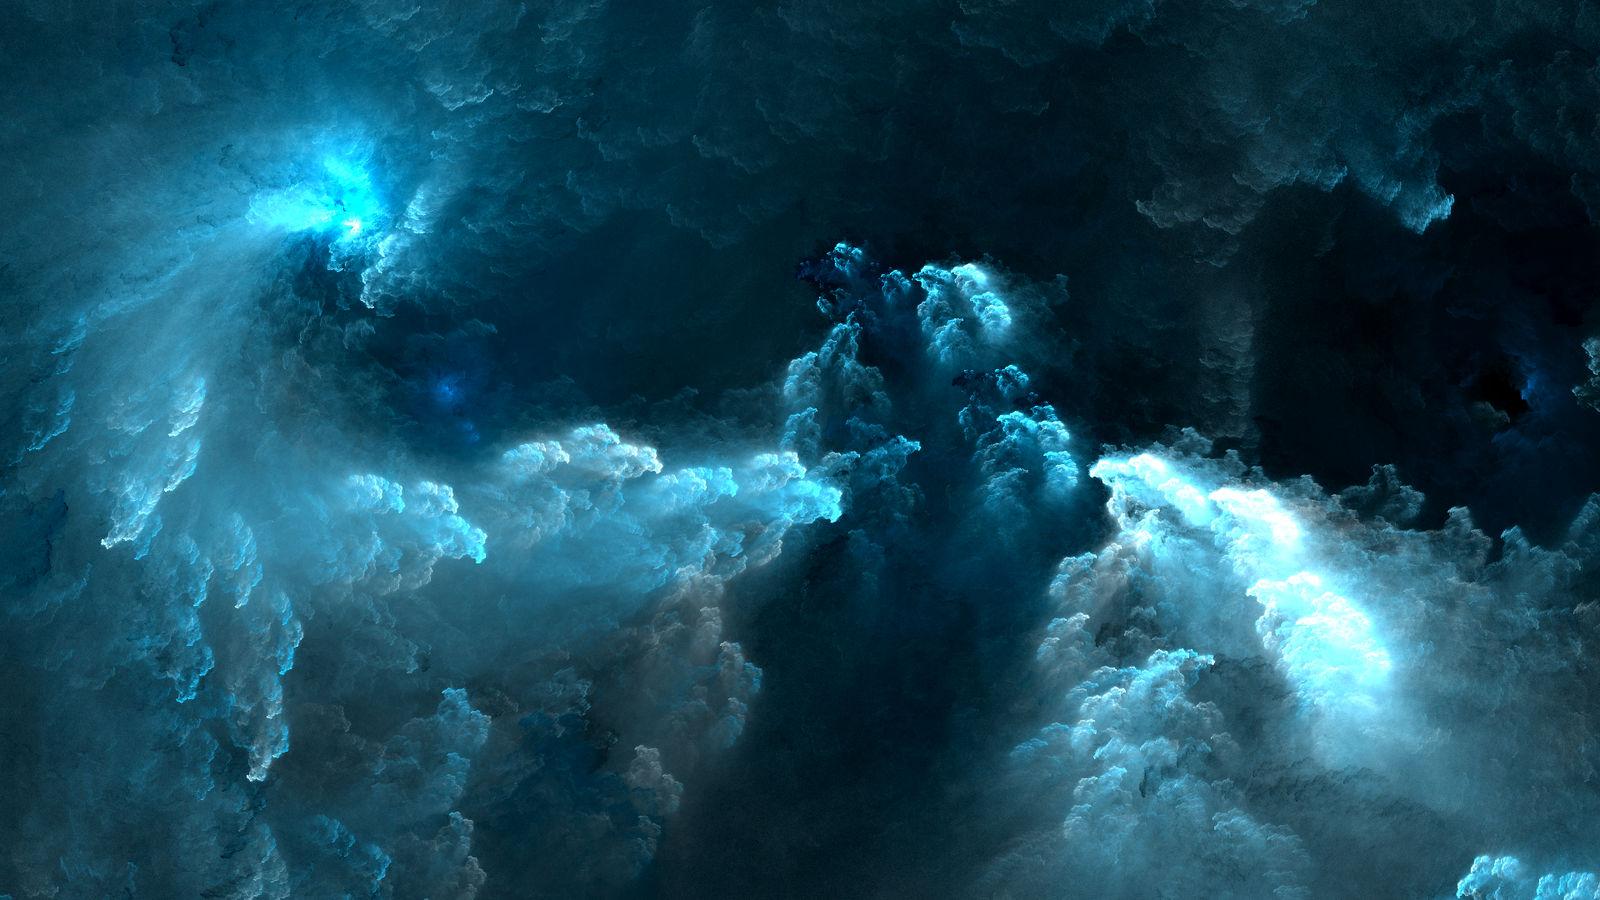 Blue invasion by luisbc